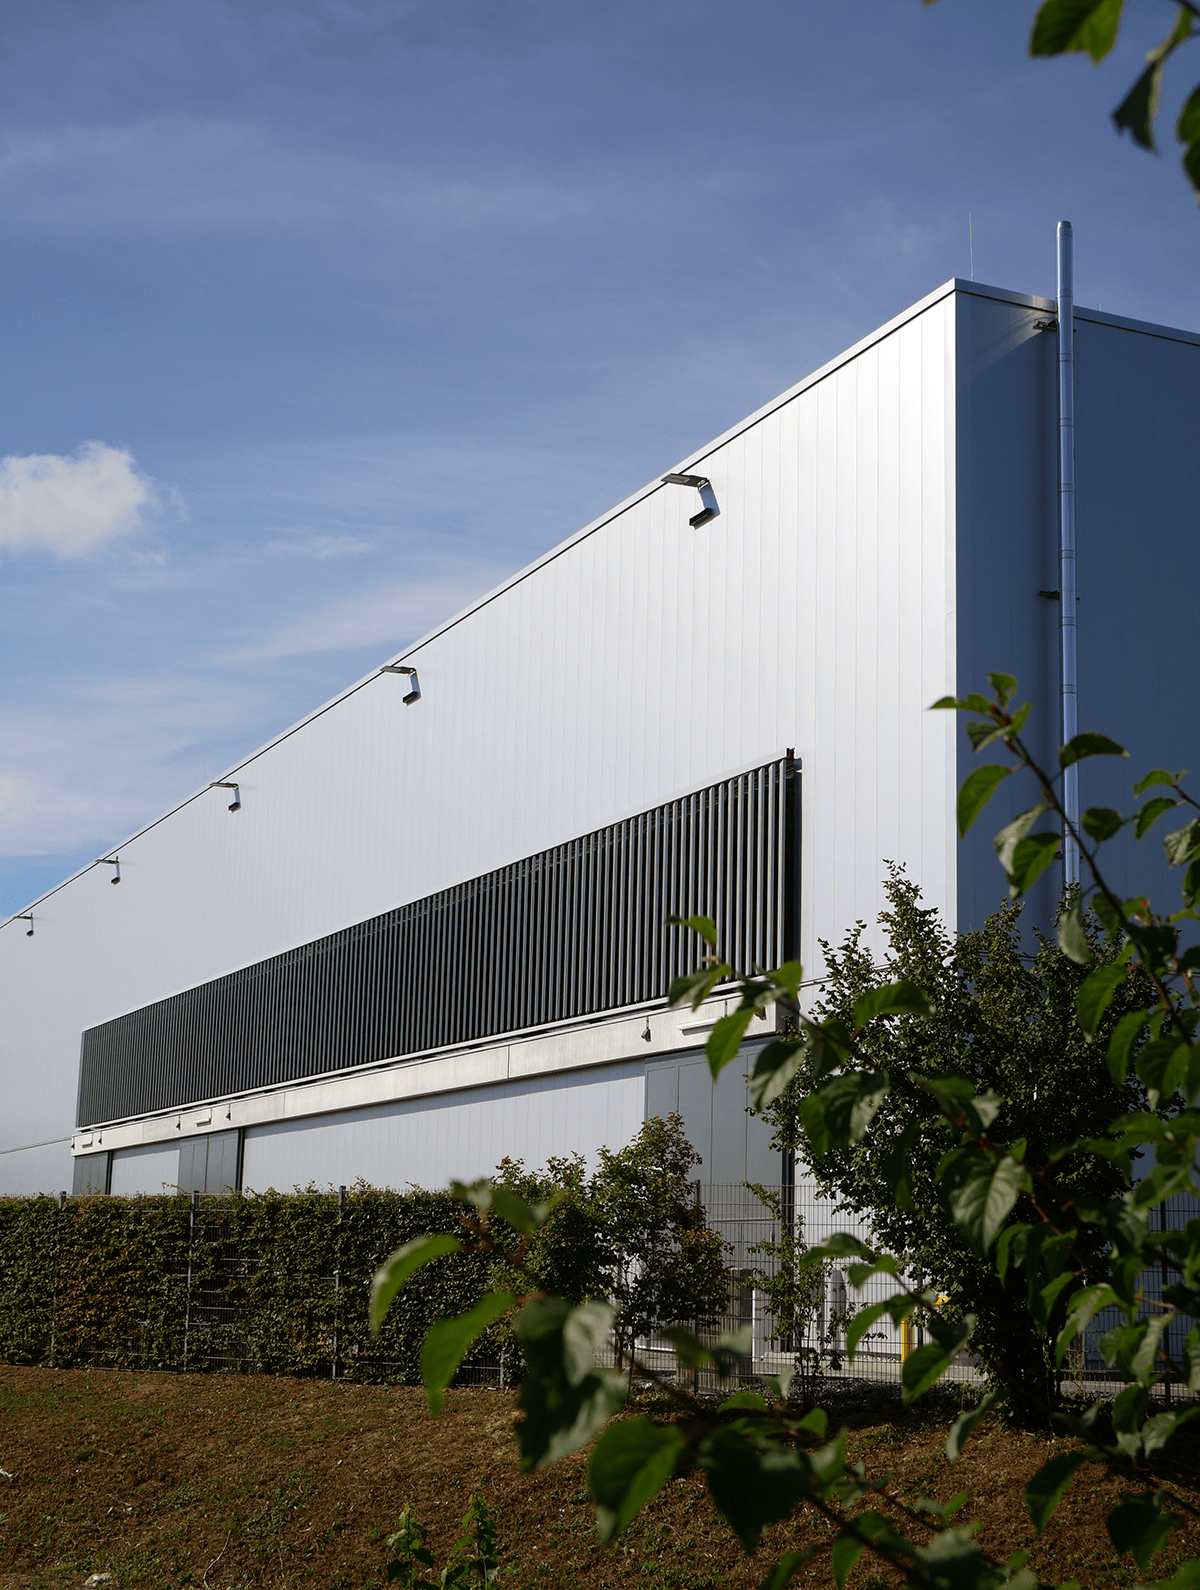 Messe Halle 2